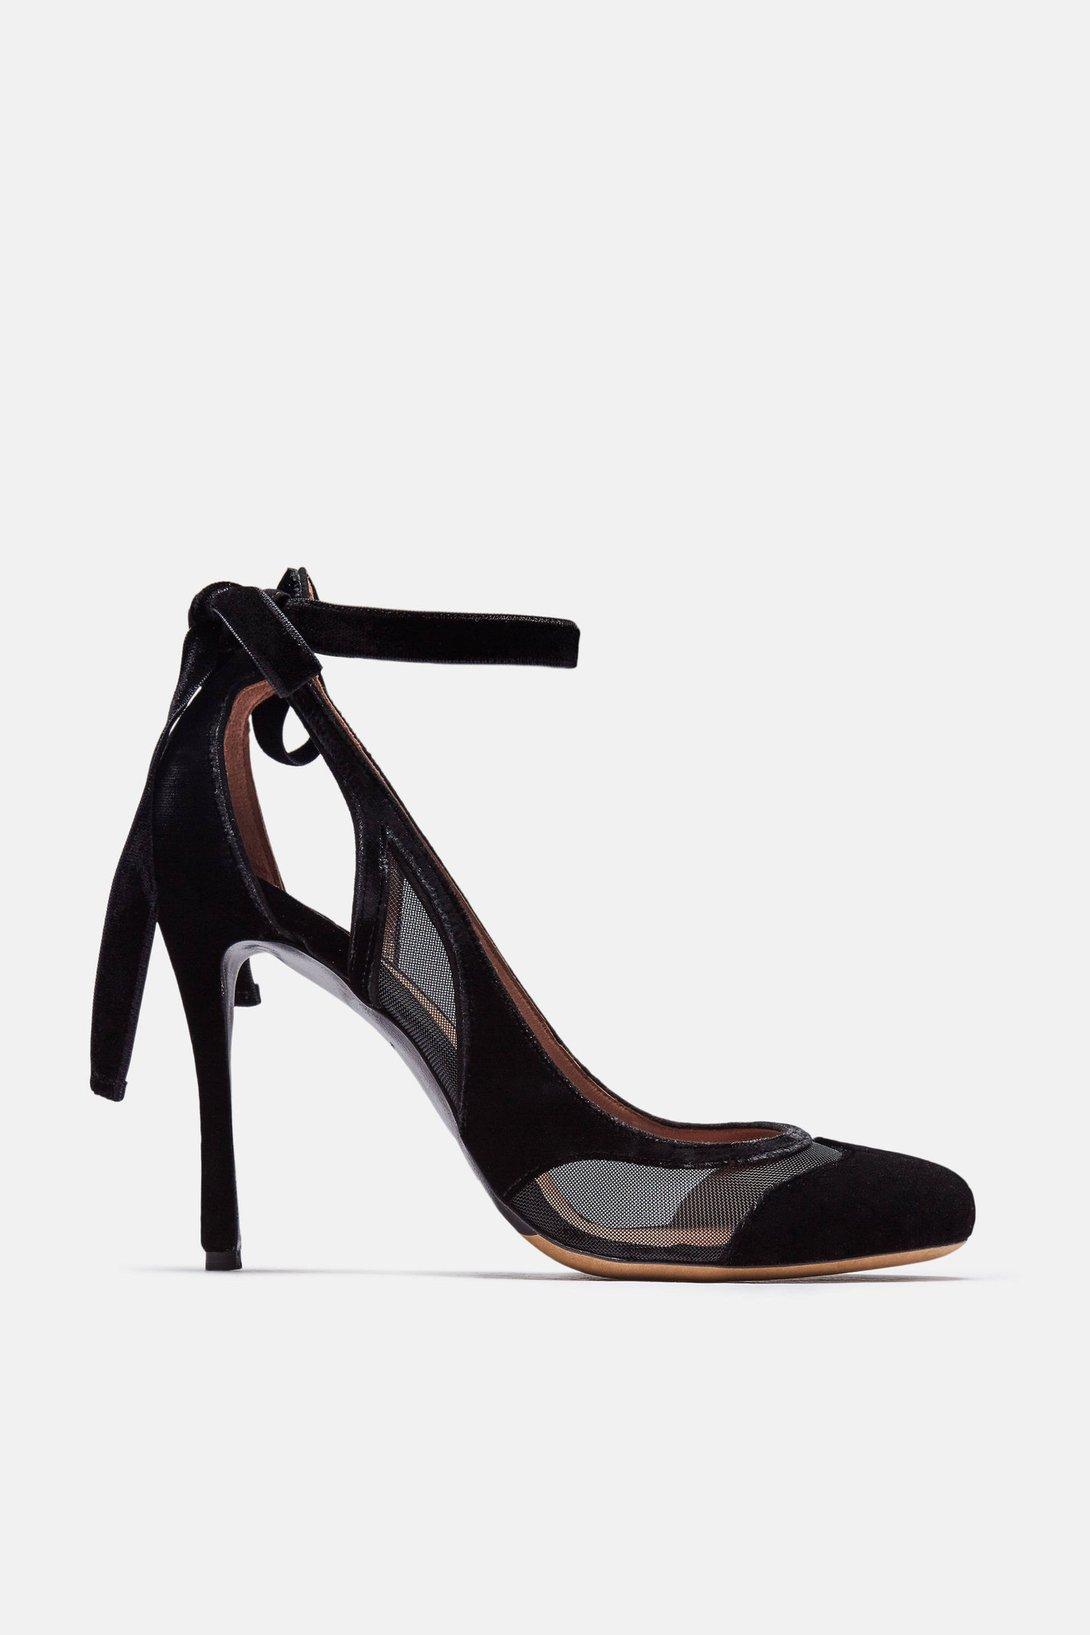 1222c889c92 full untitled-folder-3 0016 1090x.jpg. The Best of NYC Designer Sample Sale  Women s Shoes